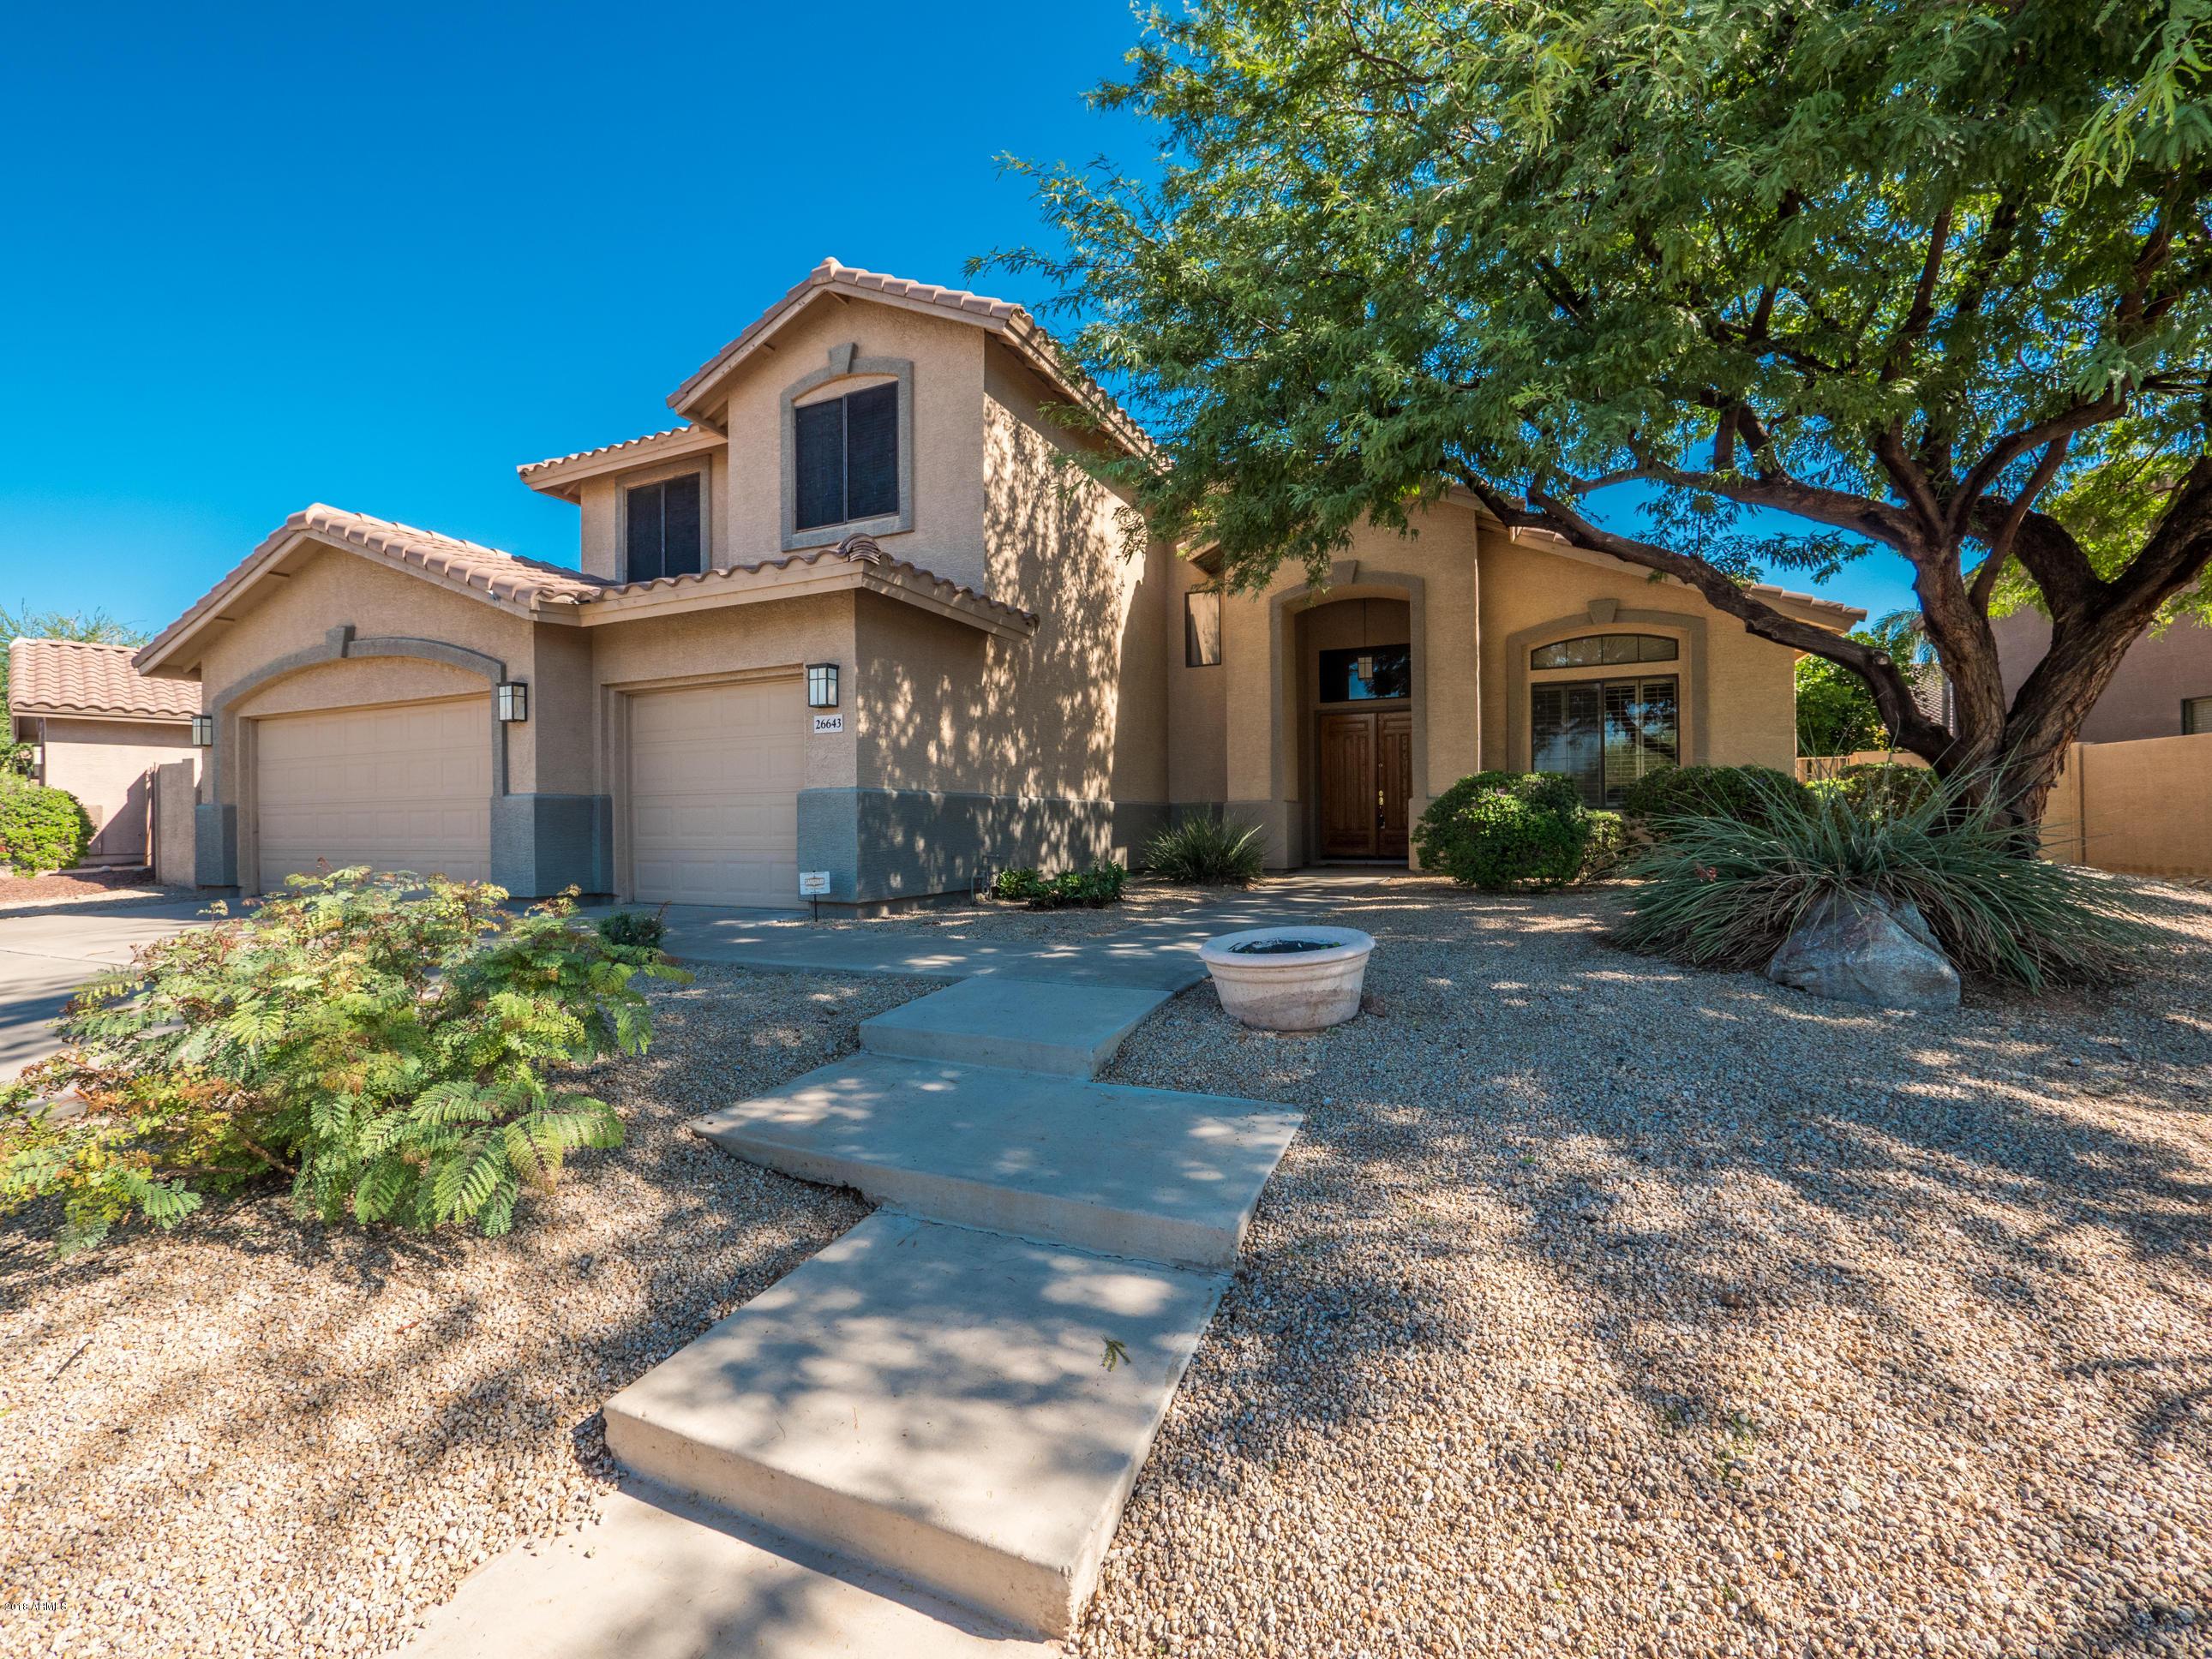 MLS 5674494 26643 N 45TH Place, Cave Creek, AZ 85331 Cave Creek AZ Tatum Ranch